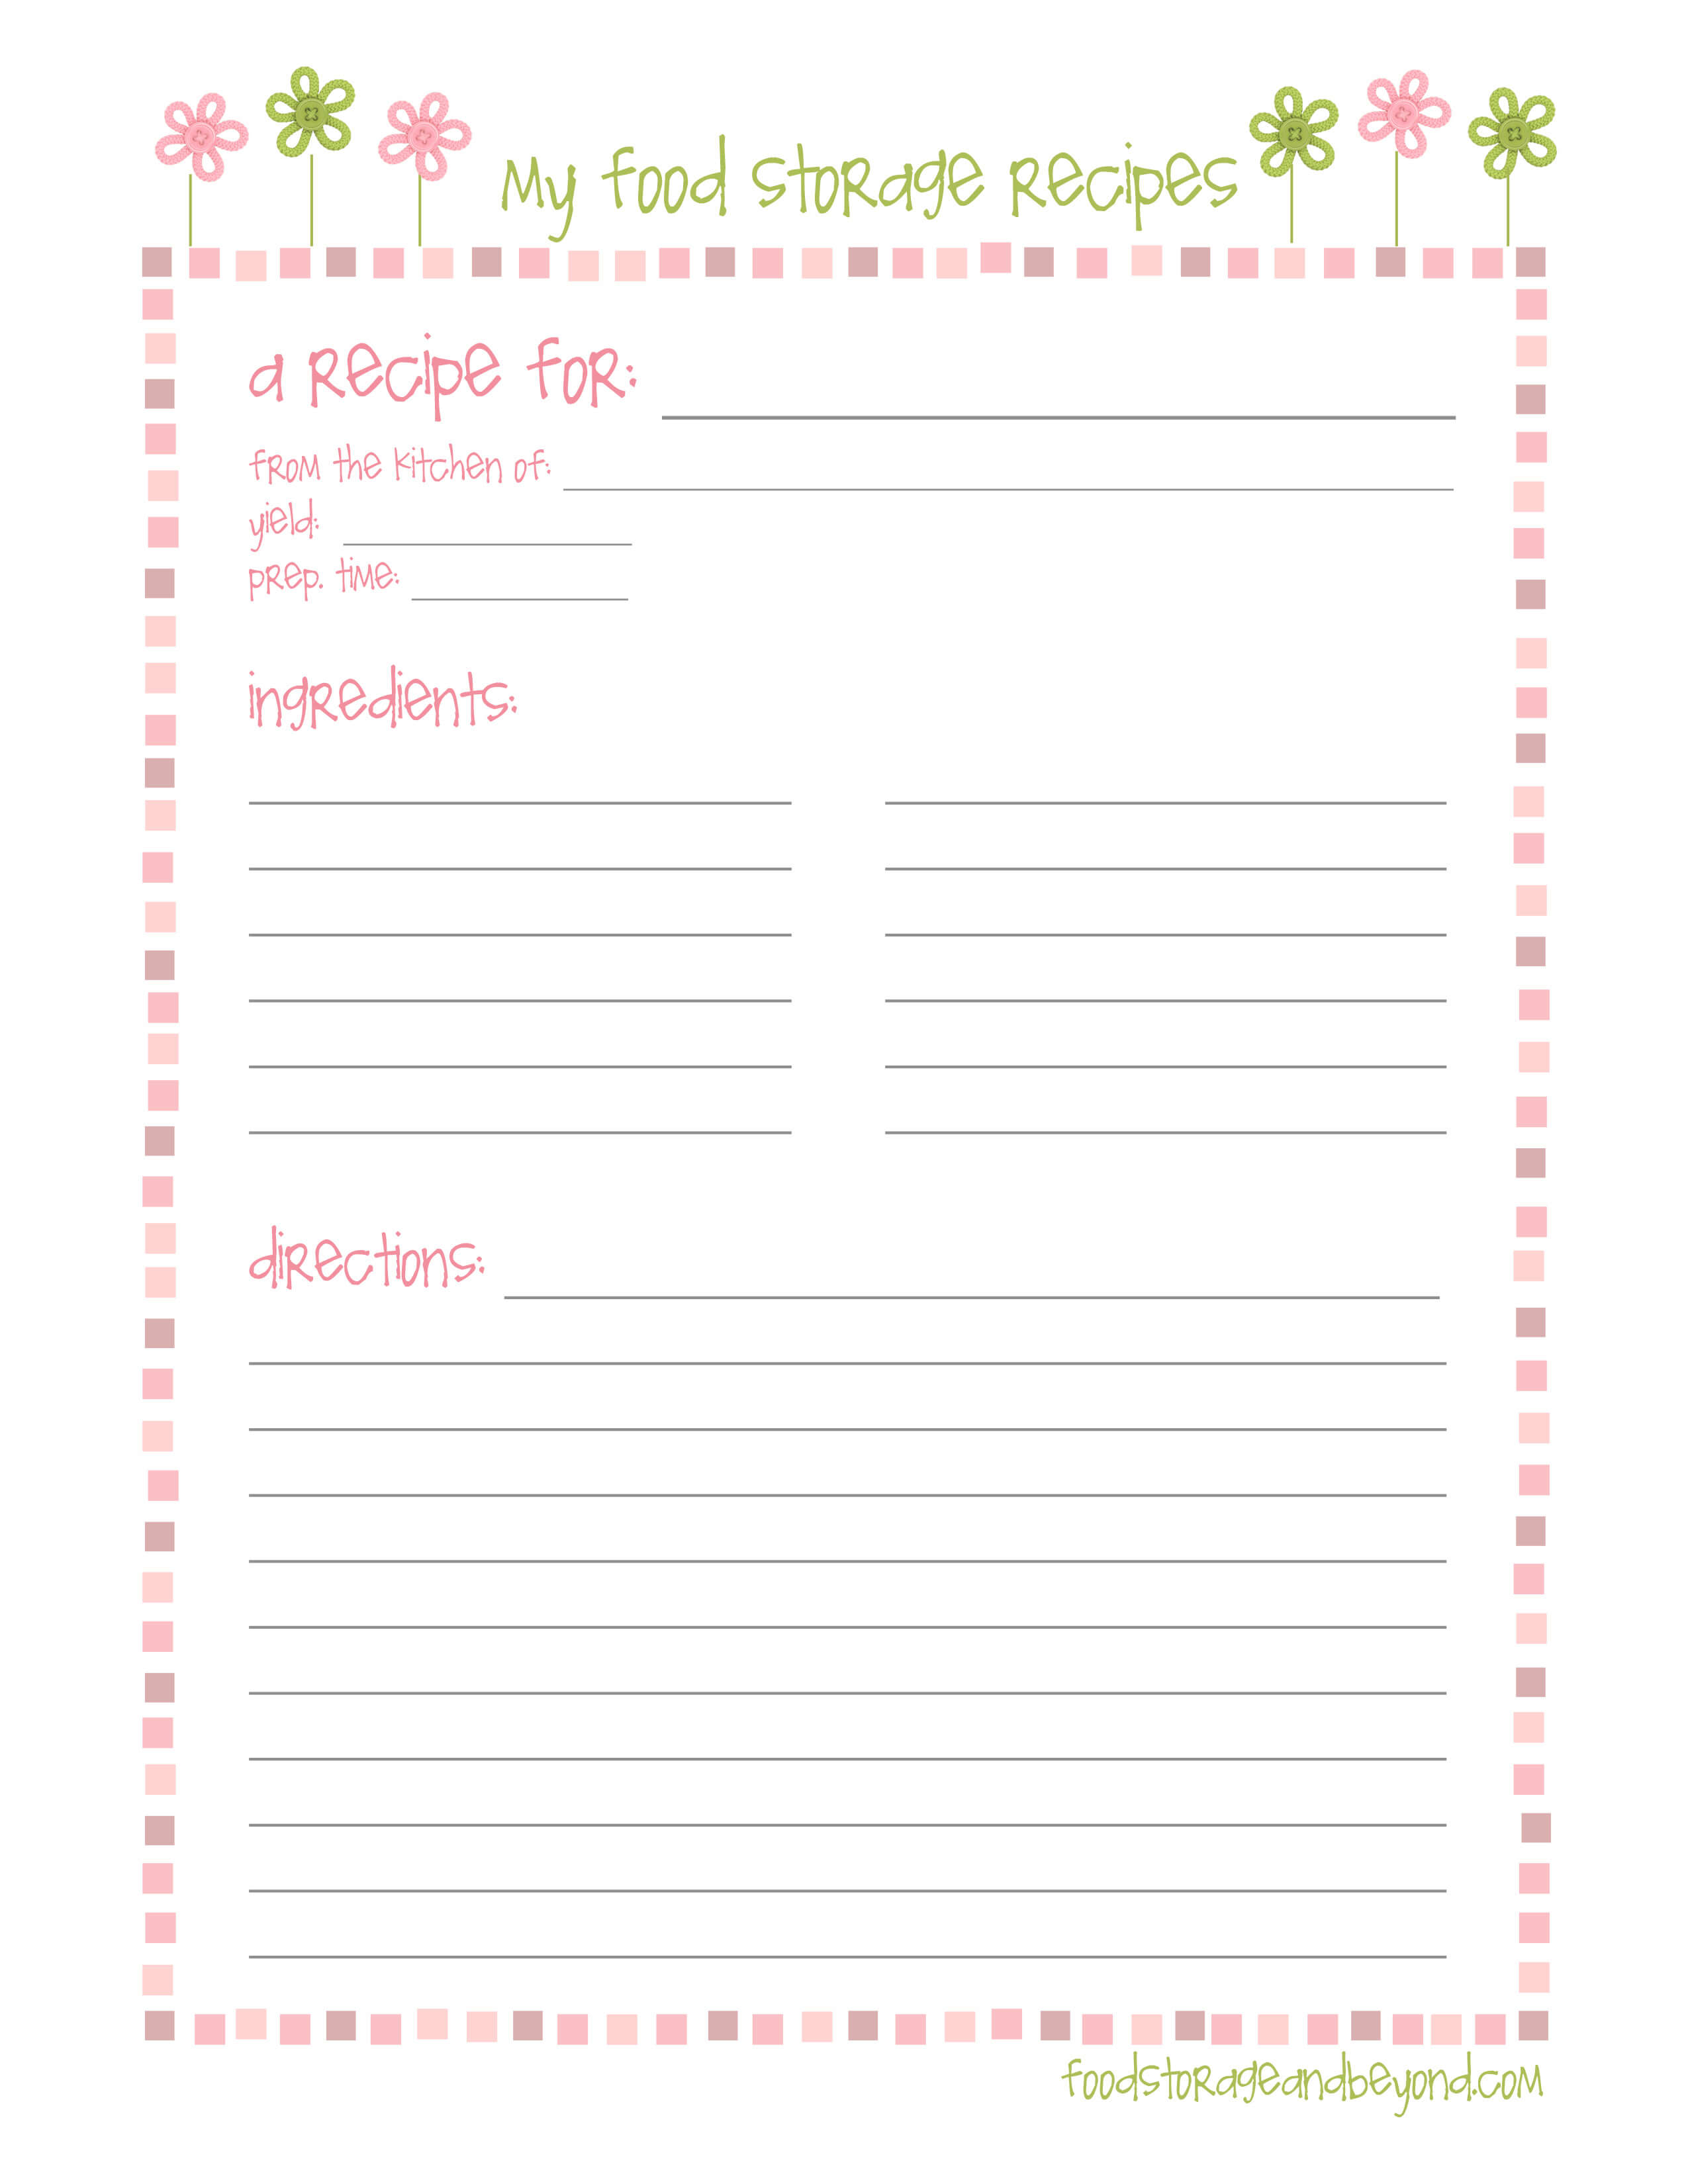 Pinjill Ortago On Happy Planning! | Printable Recipe regarding Fillable Recipe Card Template